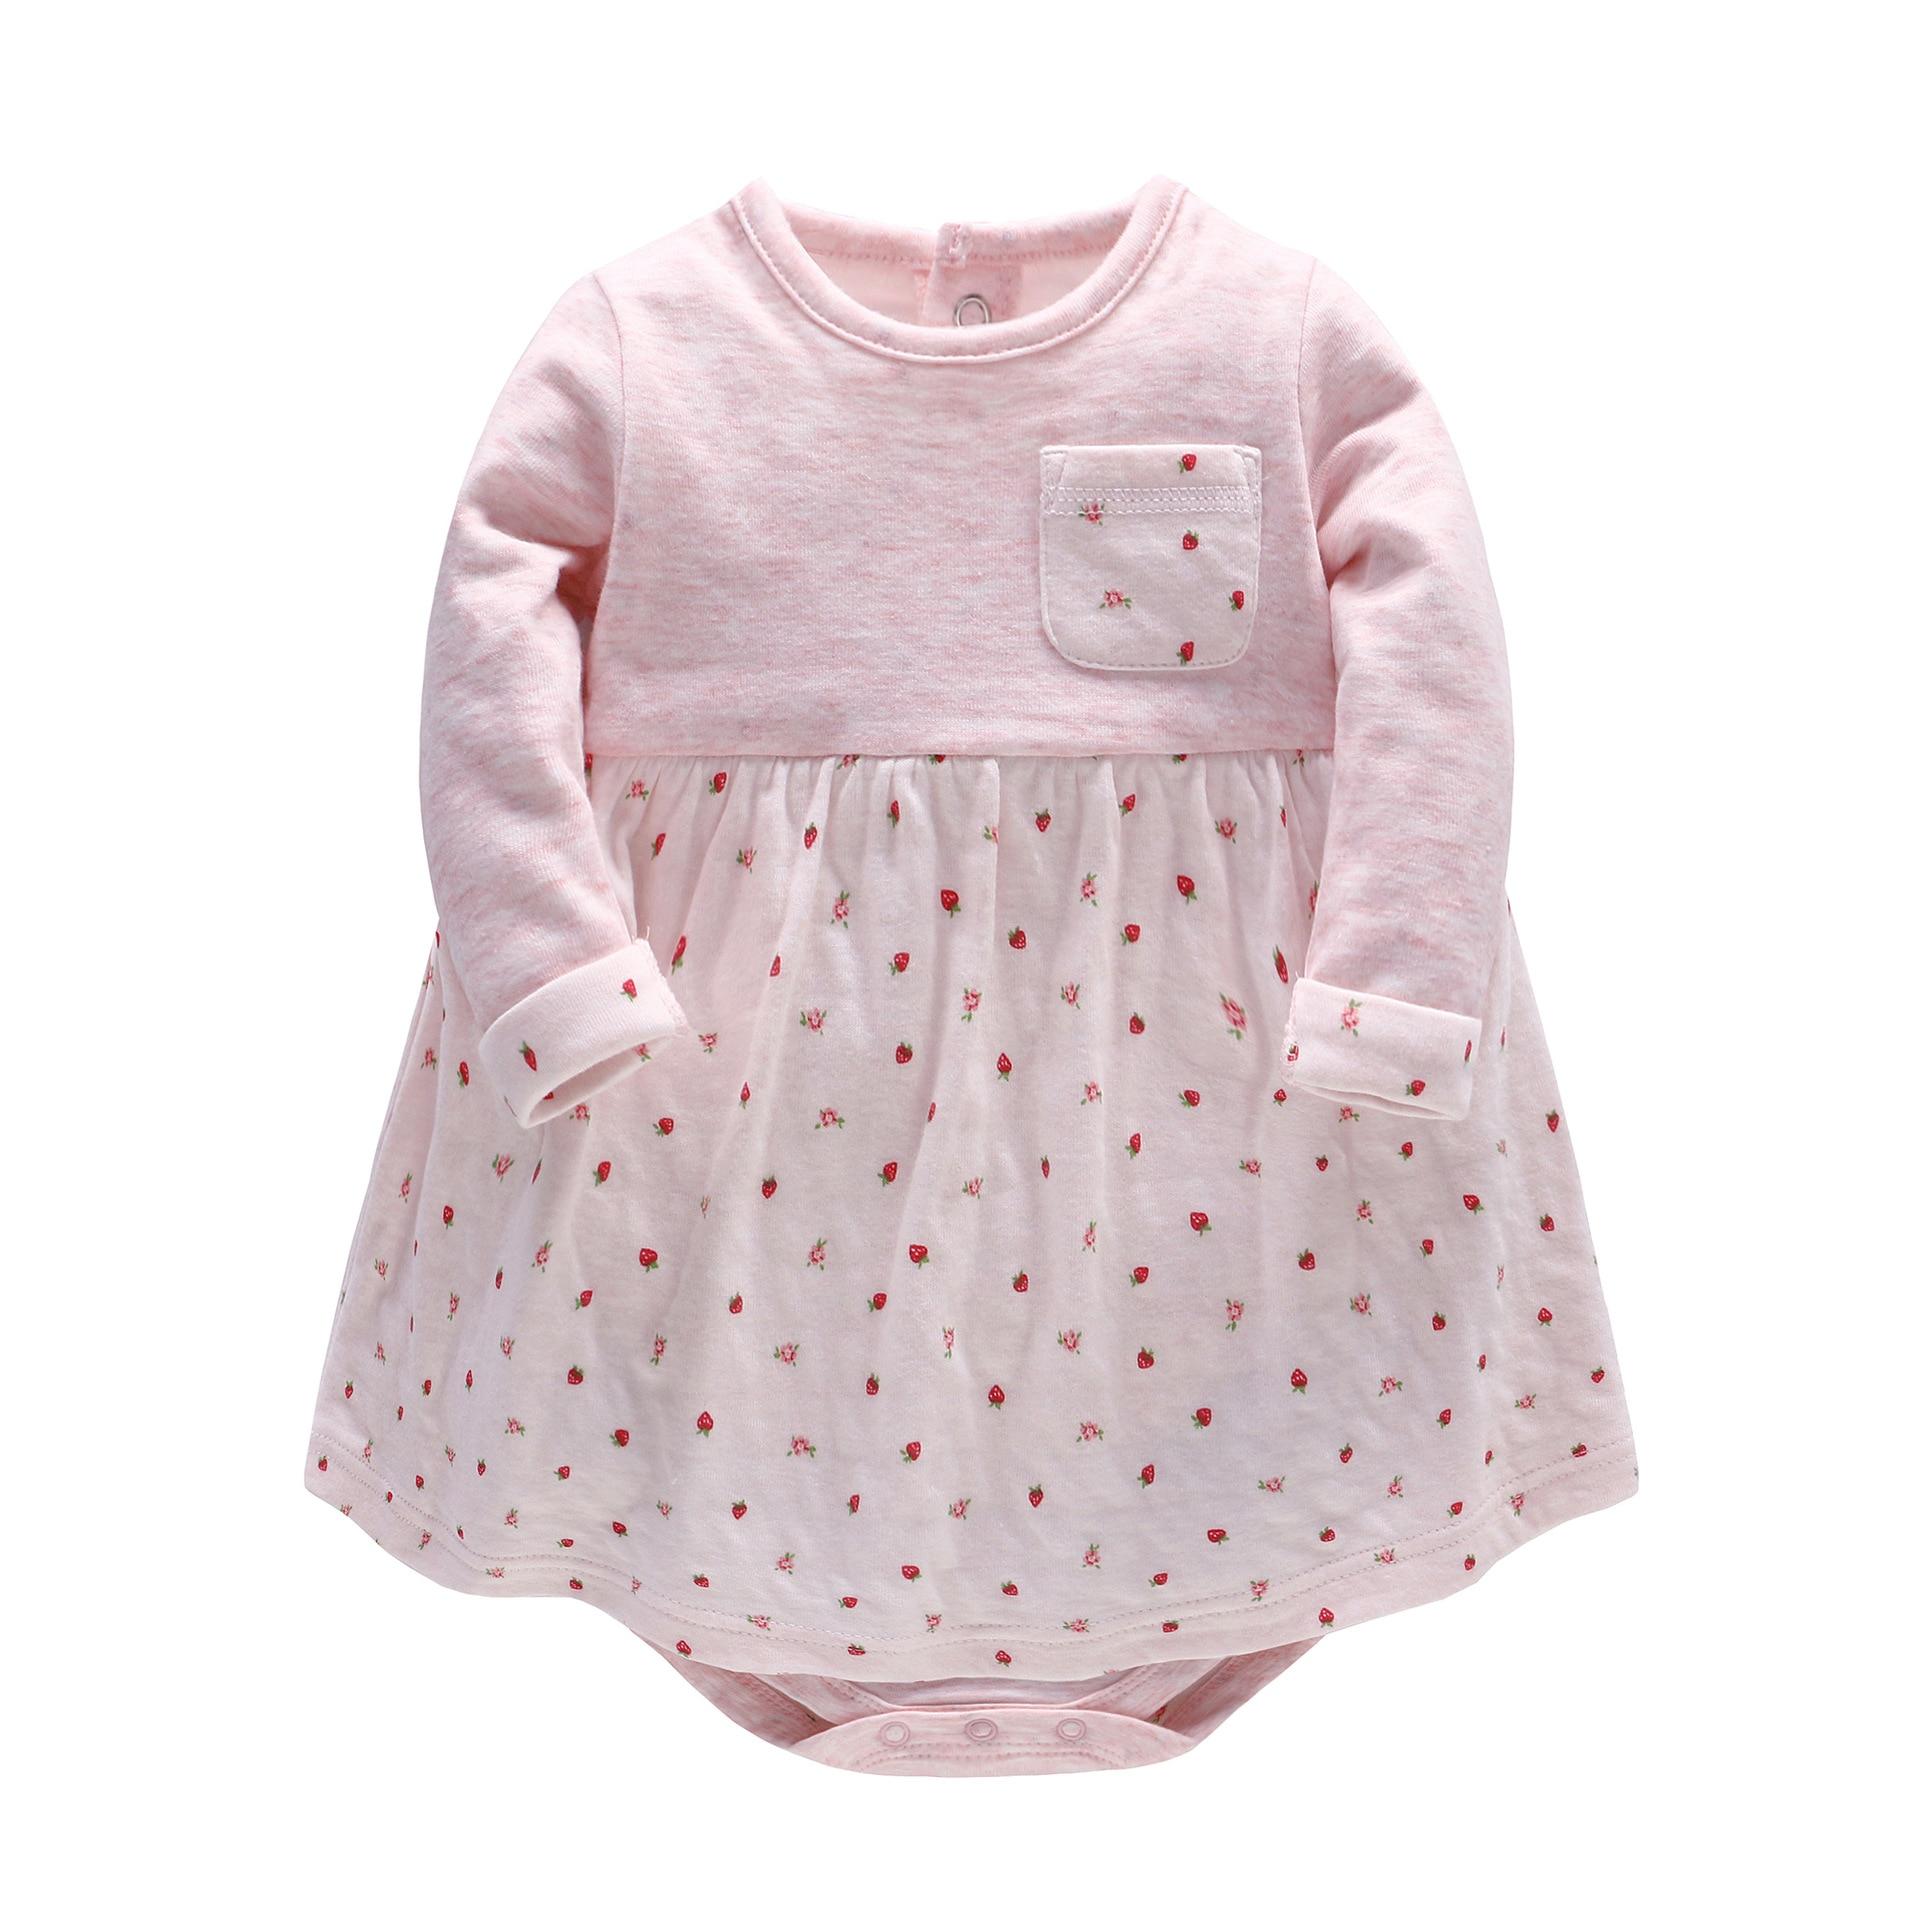 2018 New Fashion Baby Girl Dress Baby Spring Autumn Long-sleeve Strawberry Flower Printed Dress Infants Cotton Birthday Dresses